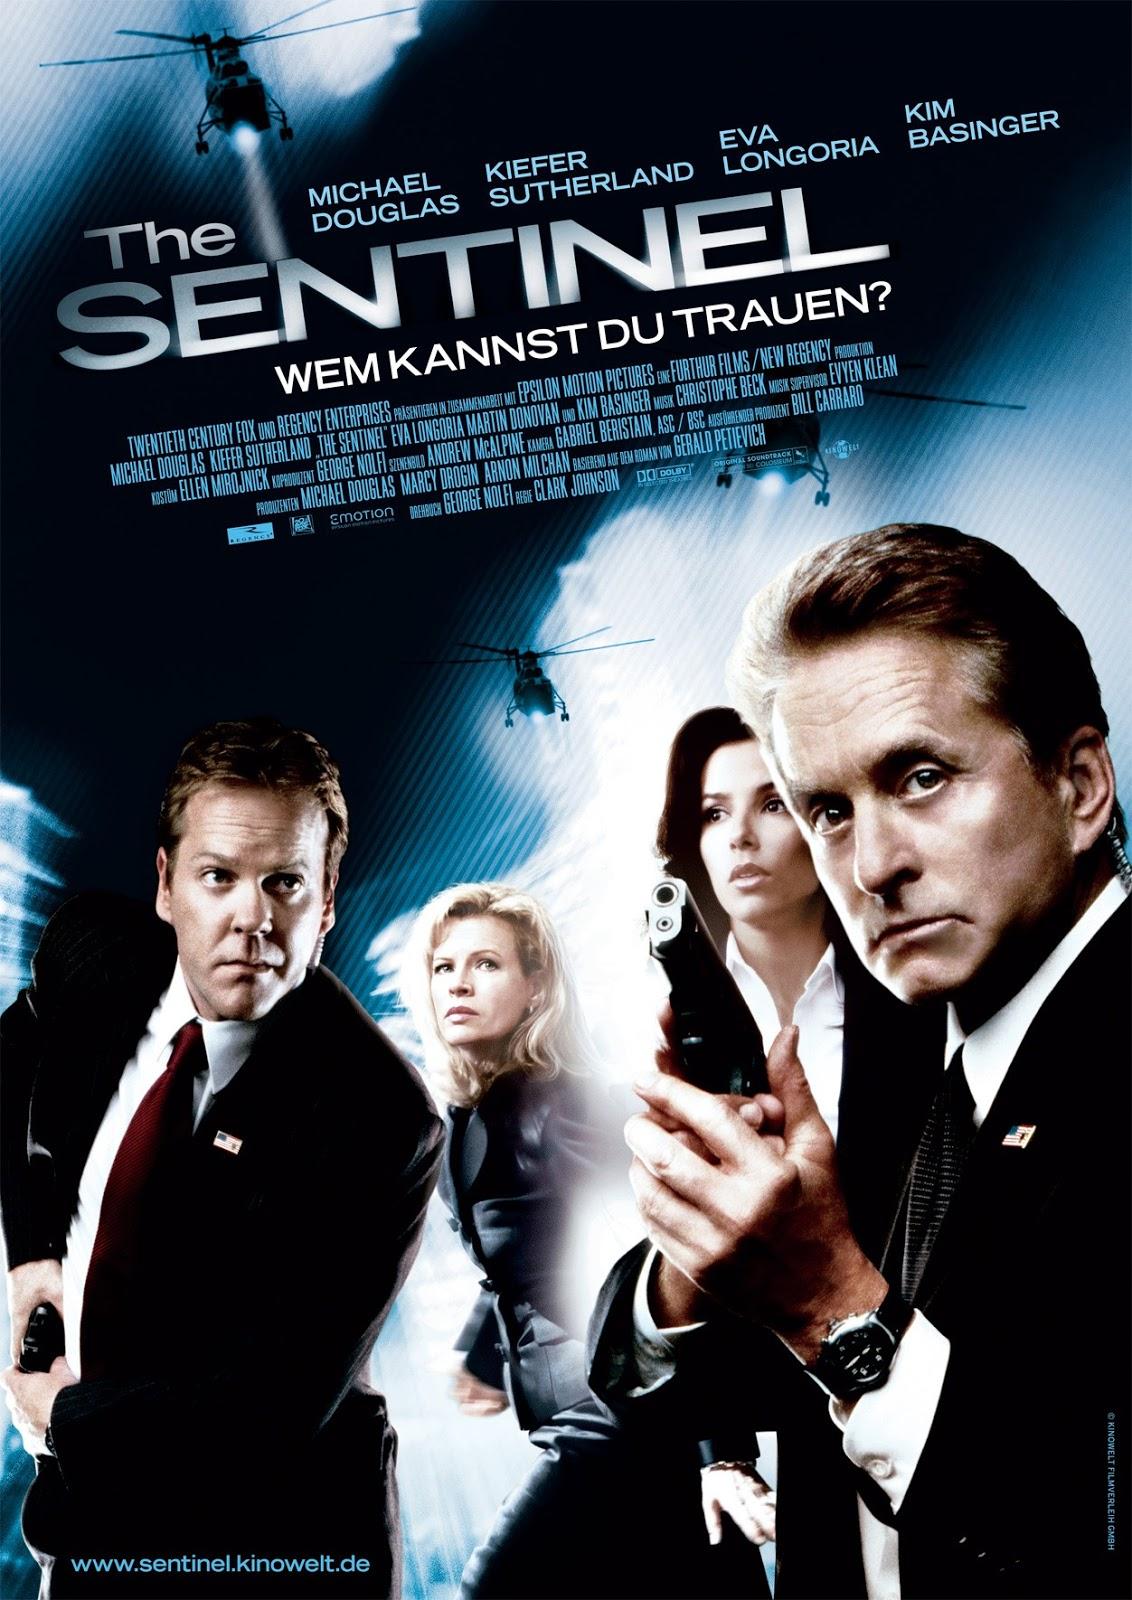 The Sentinel เดอะ เซนทิเนล โคตรคนขัดคำสั่งตาย [HD][พากย์ไทย]